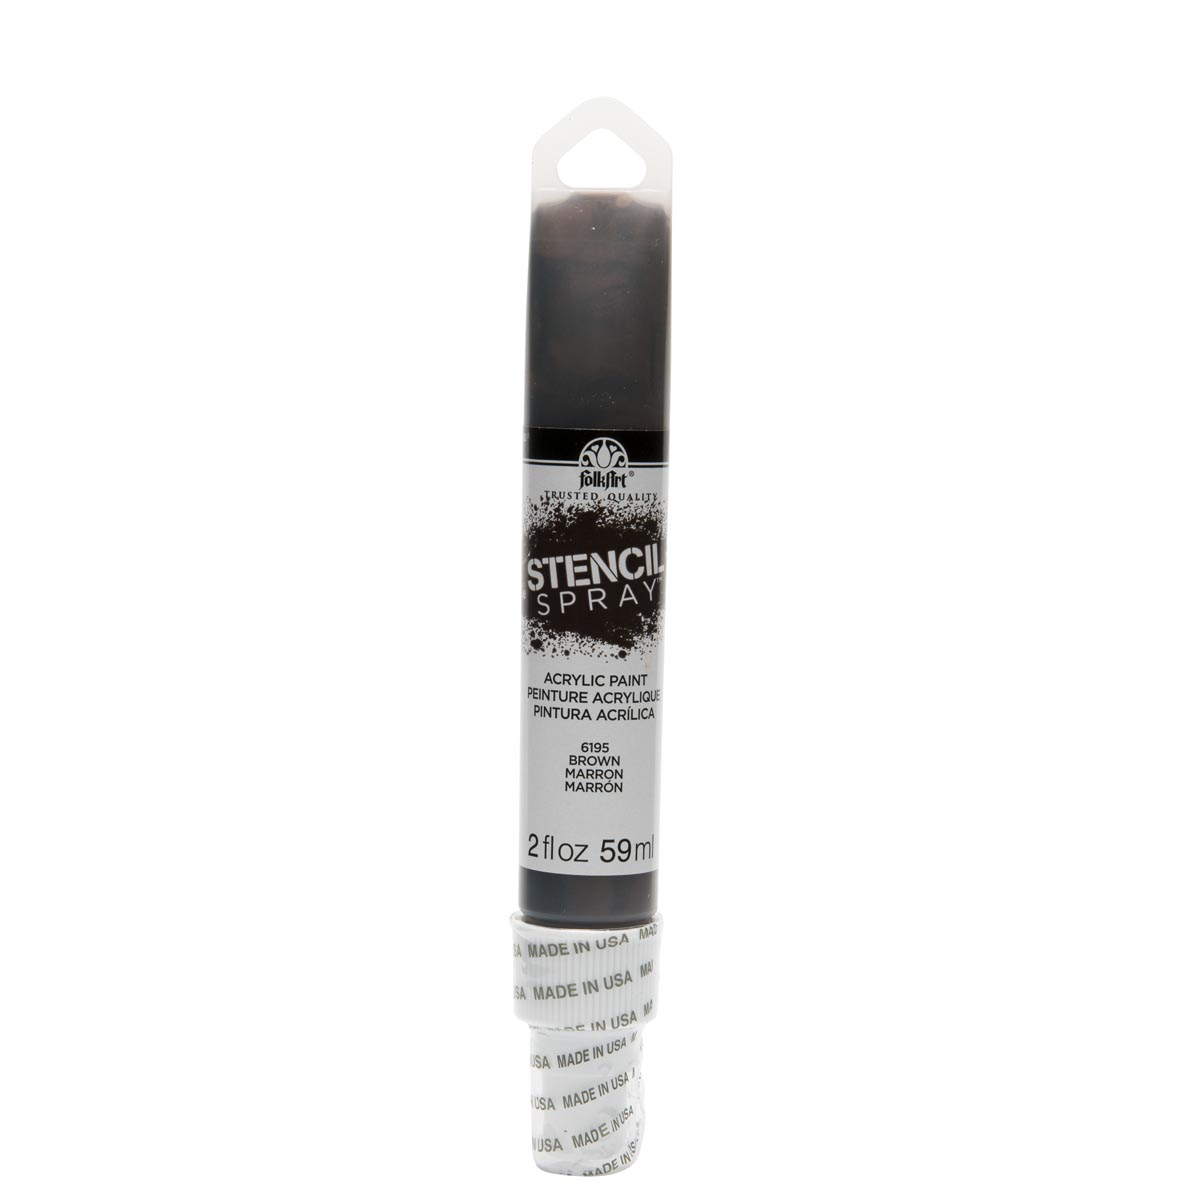 FolkArt ® Stencil Spray™ Acrylic Paint - Brown, 2 oz. - 6195